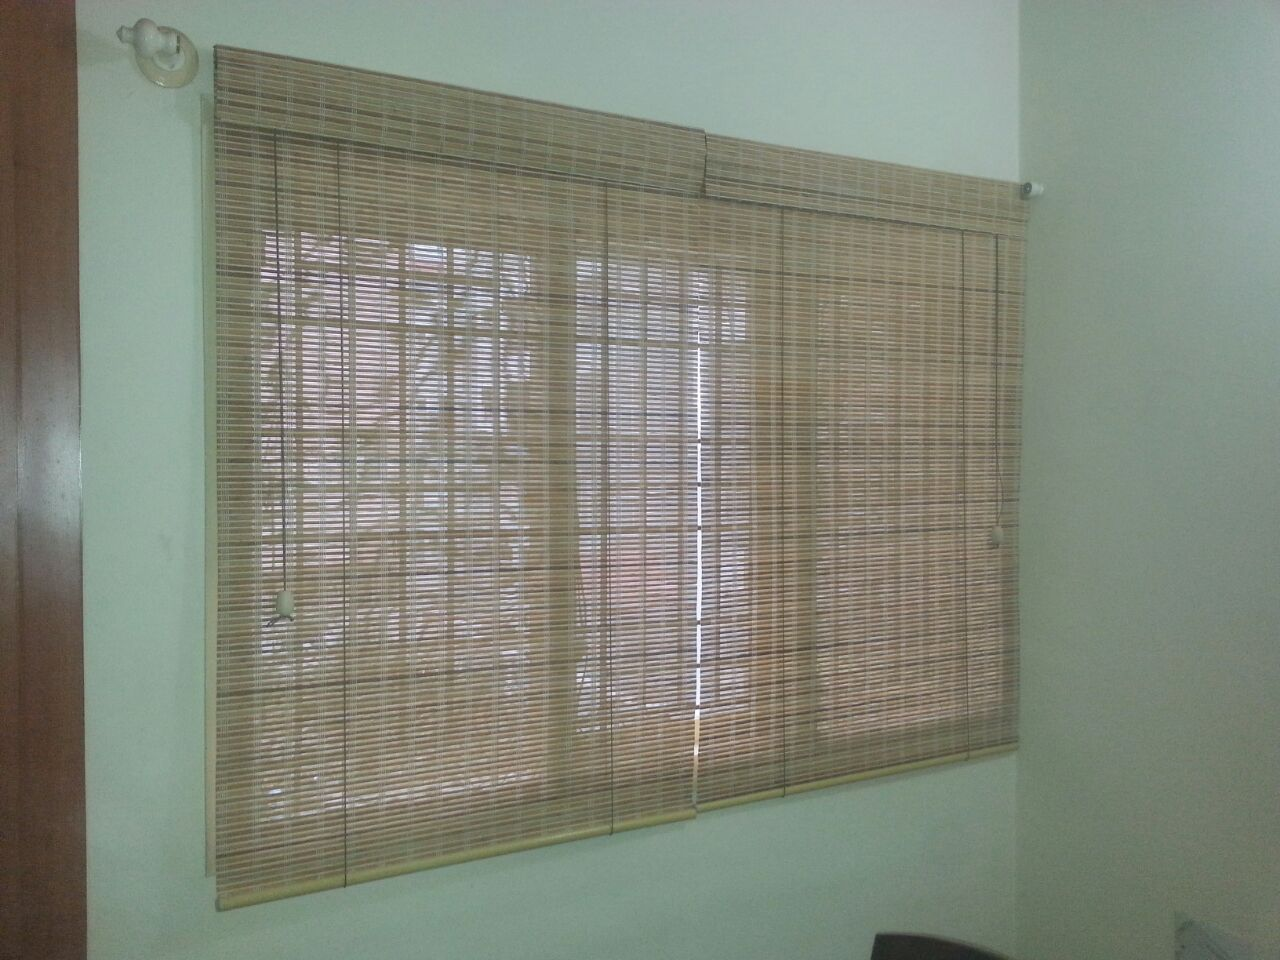 Bamboo Chick Blinds Bangalore Bamboo Screens Bangalore Bamboo Curtains Bangalore